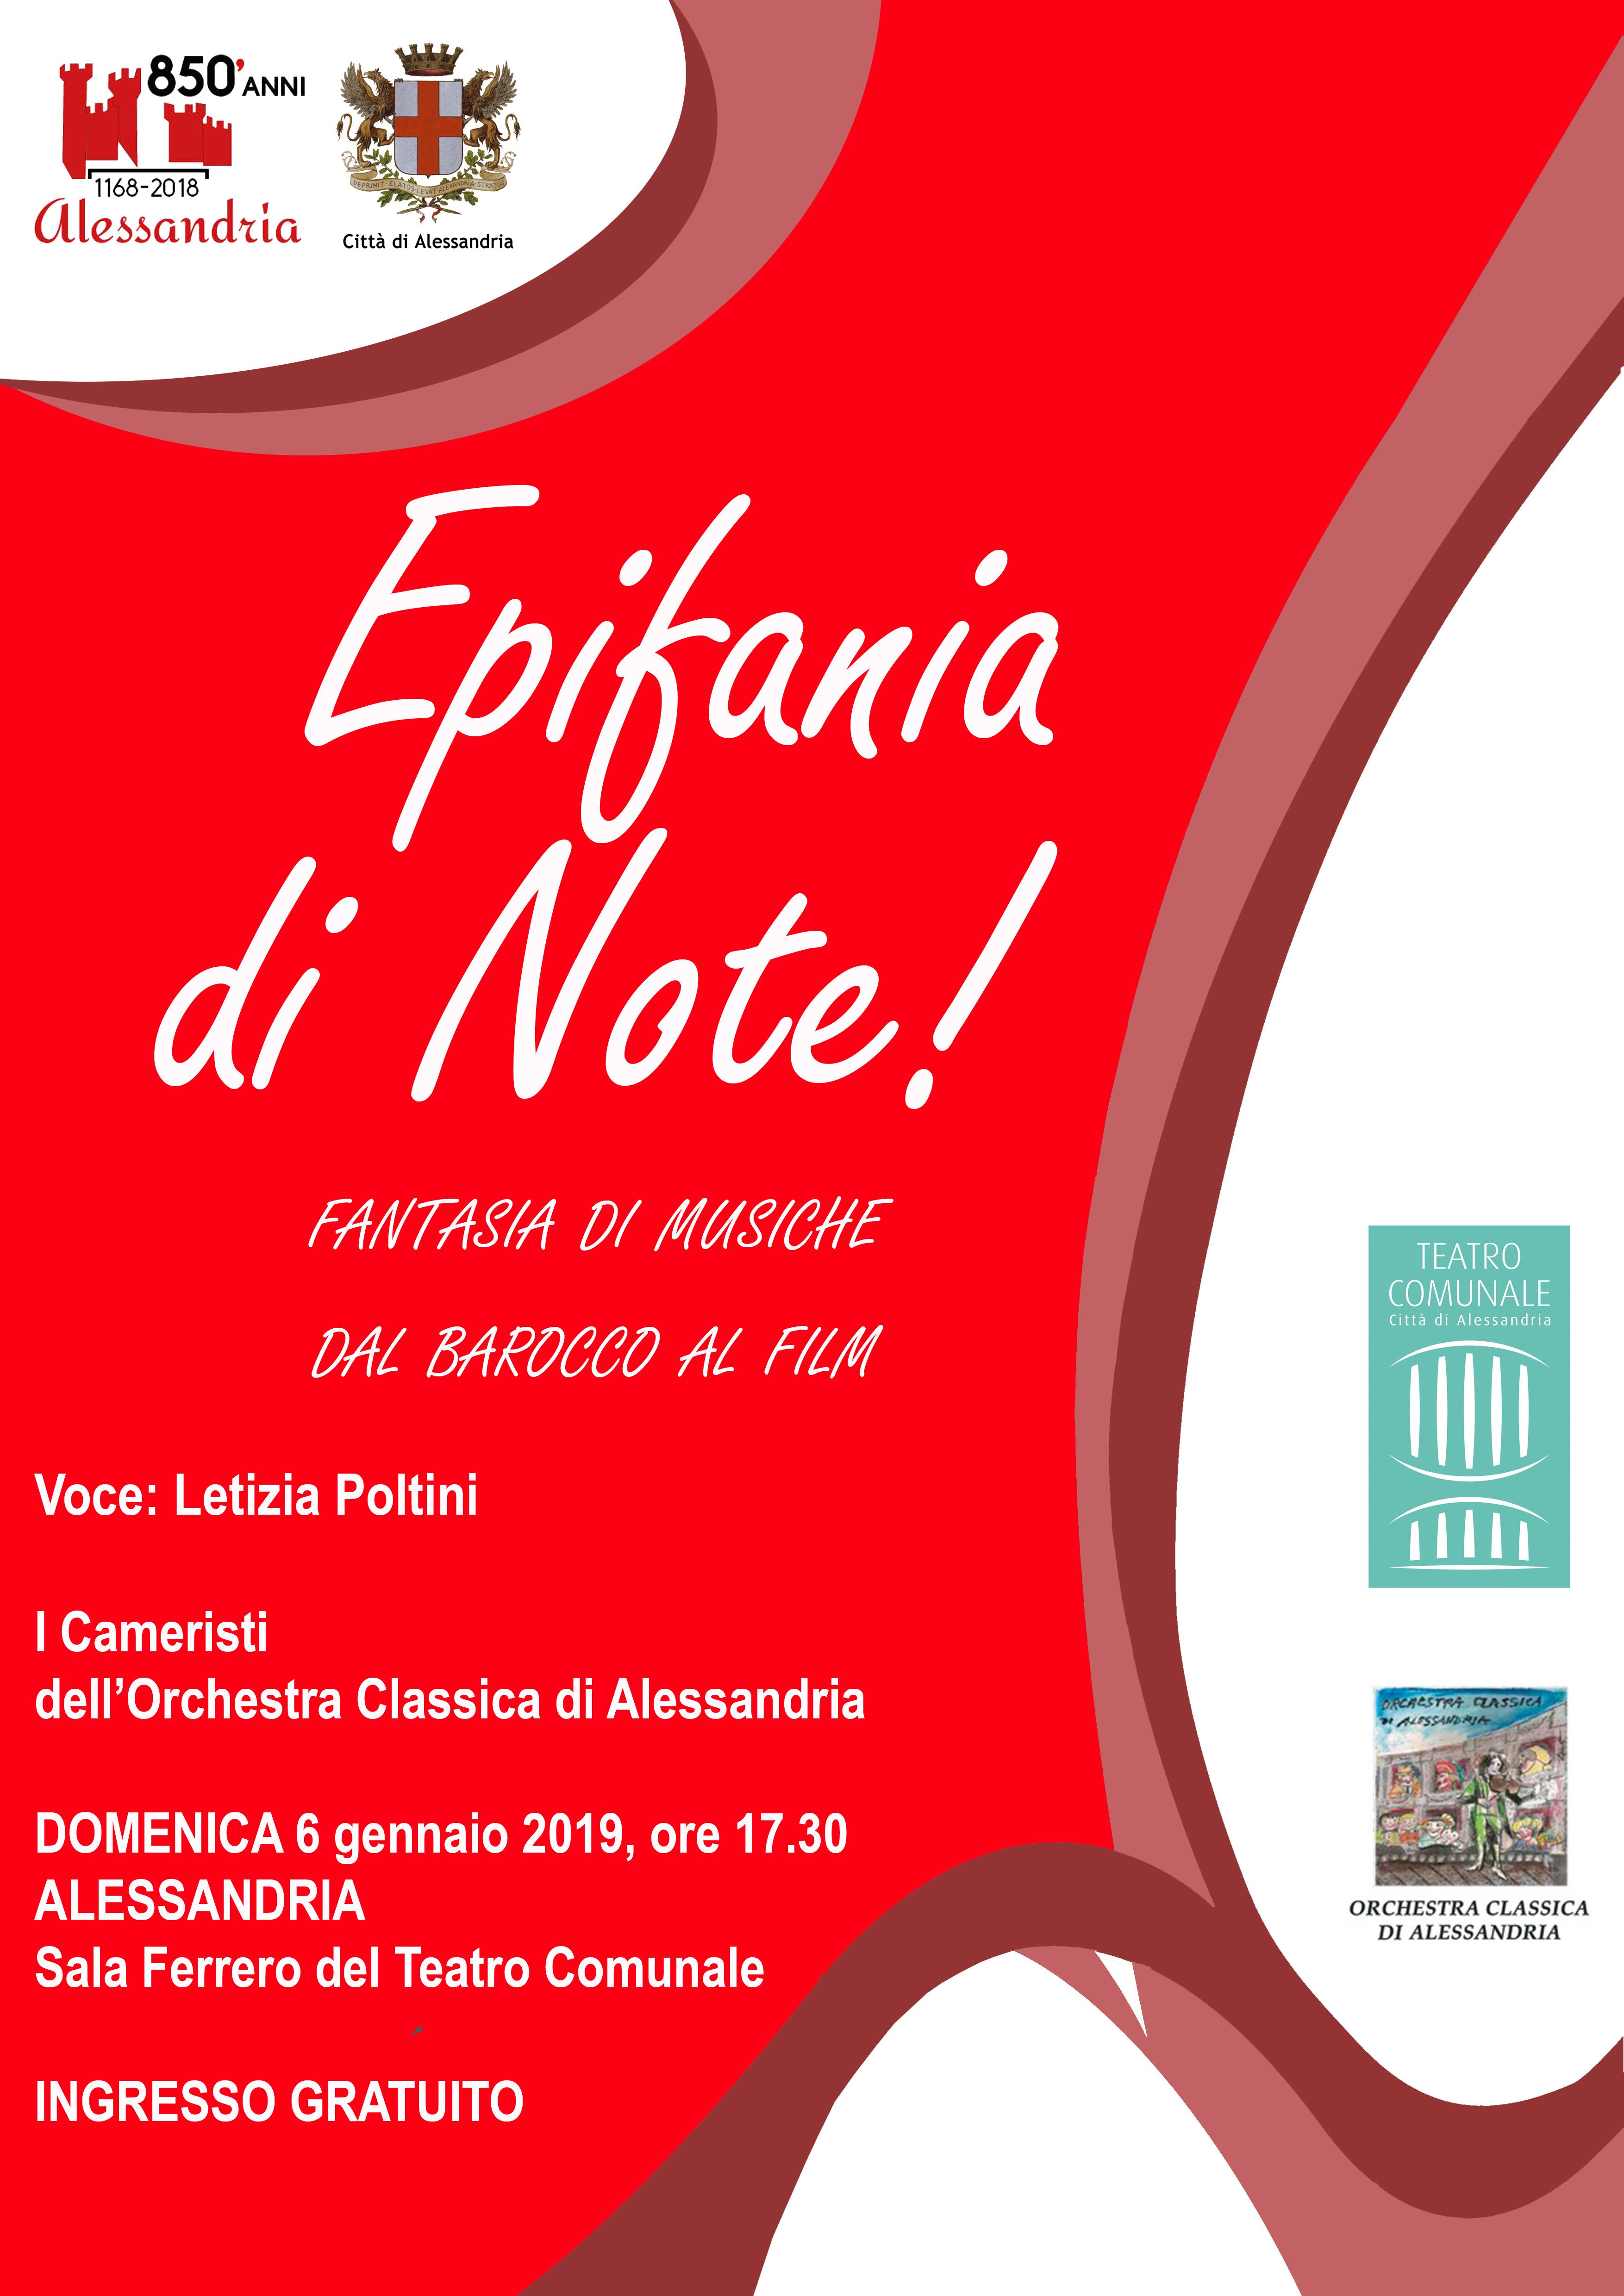 Locandina Concerto Epifania Alessandria 2019